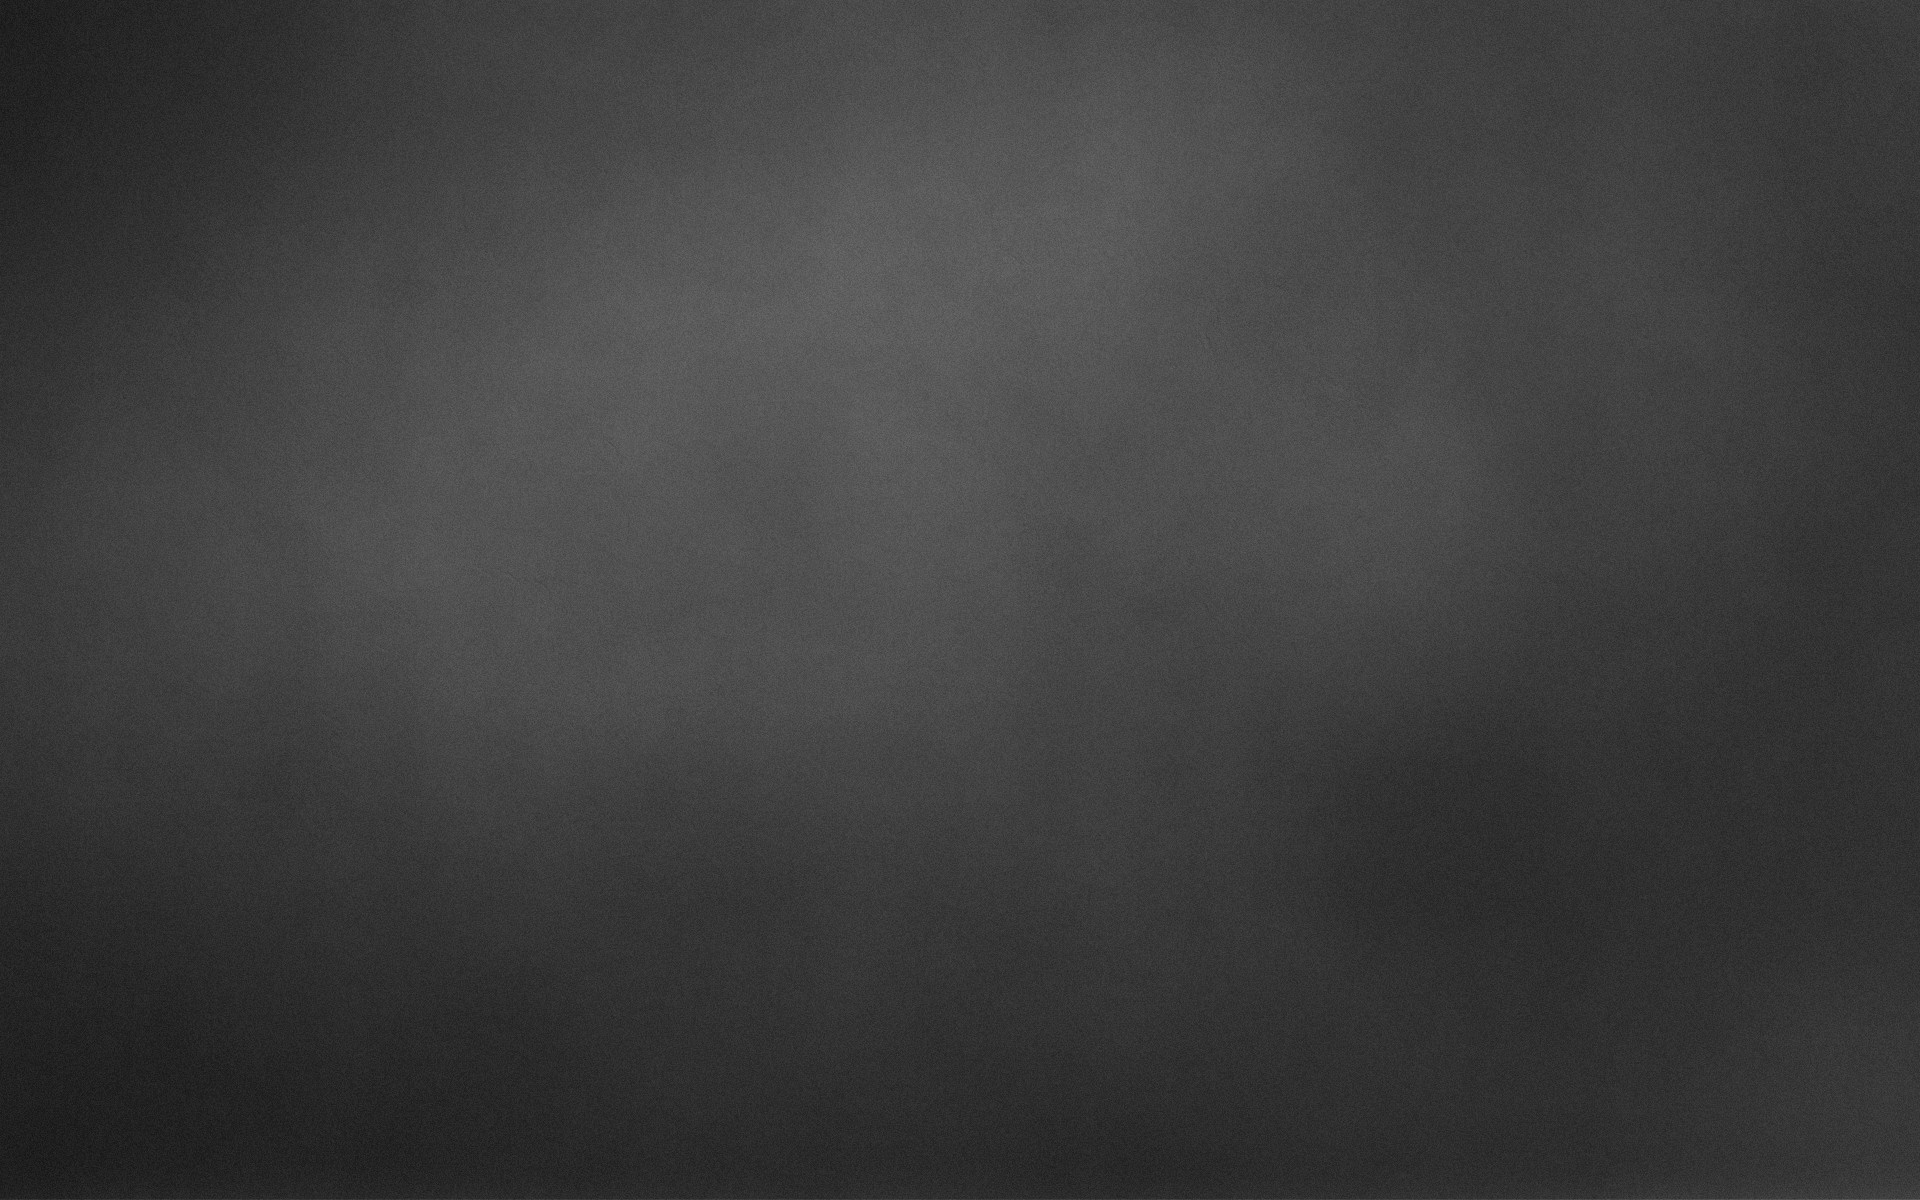 Abstract – Grey Gray Texture Wallpaper